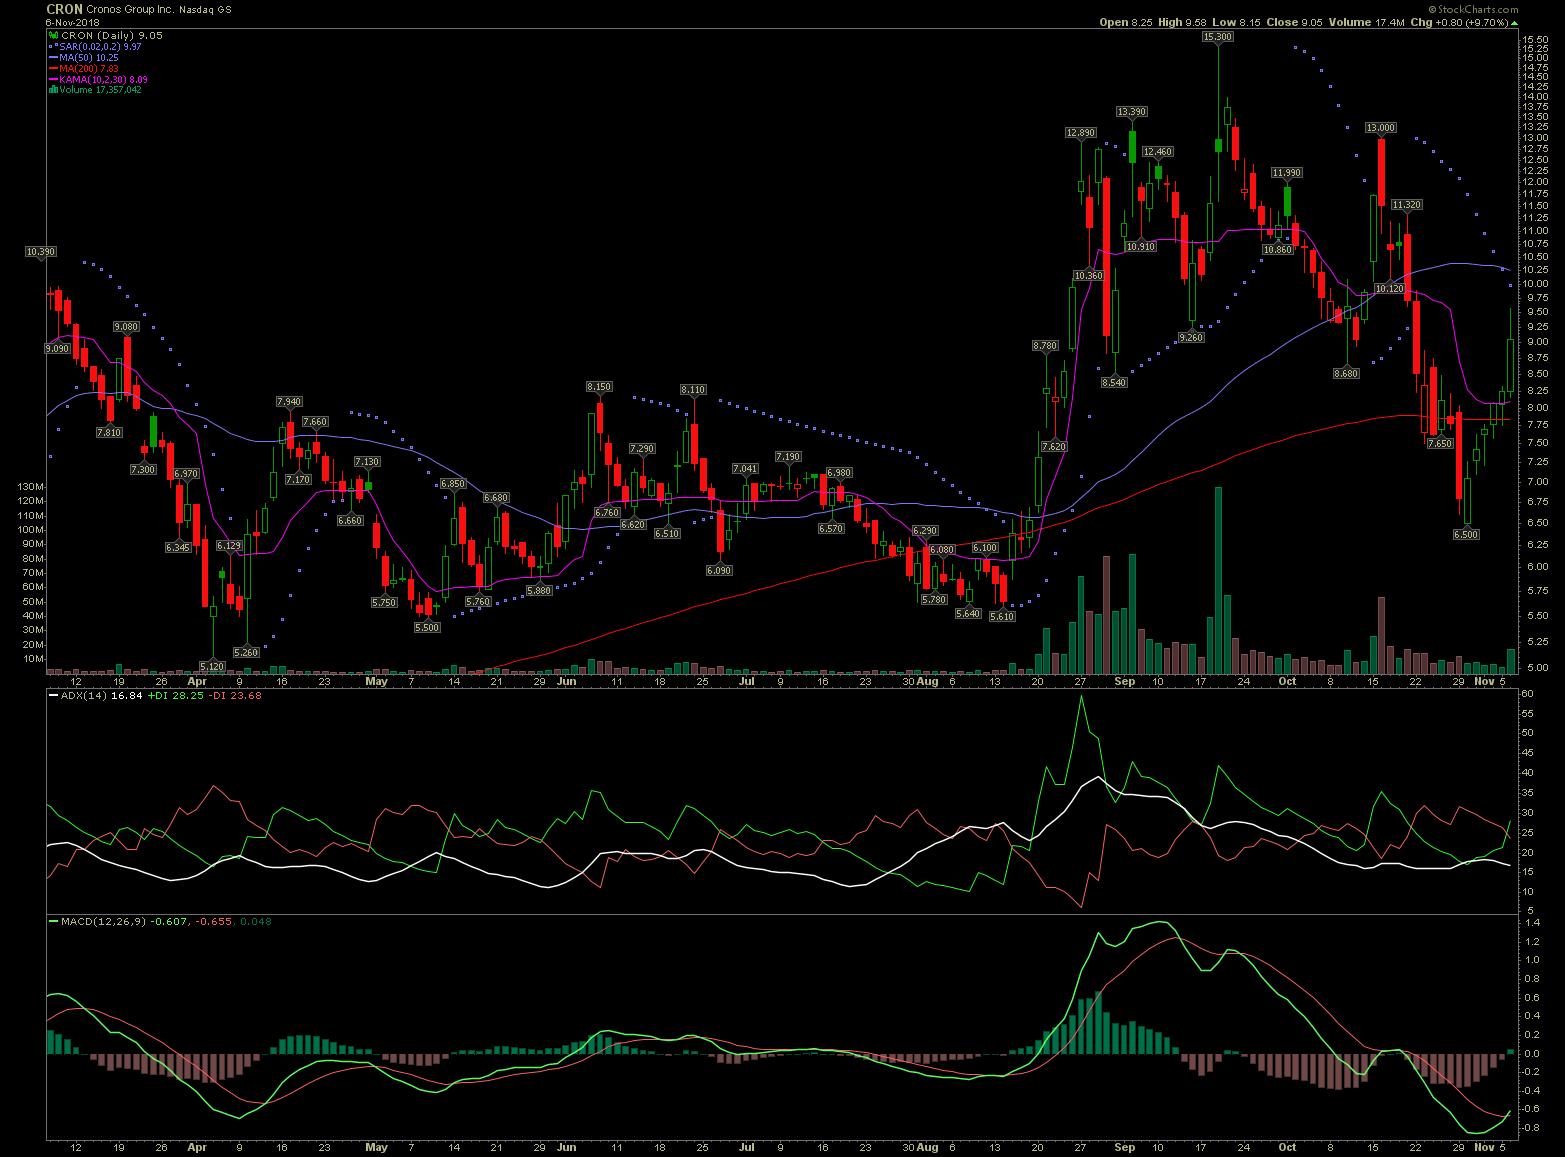 CRON stock chart